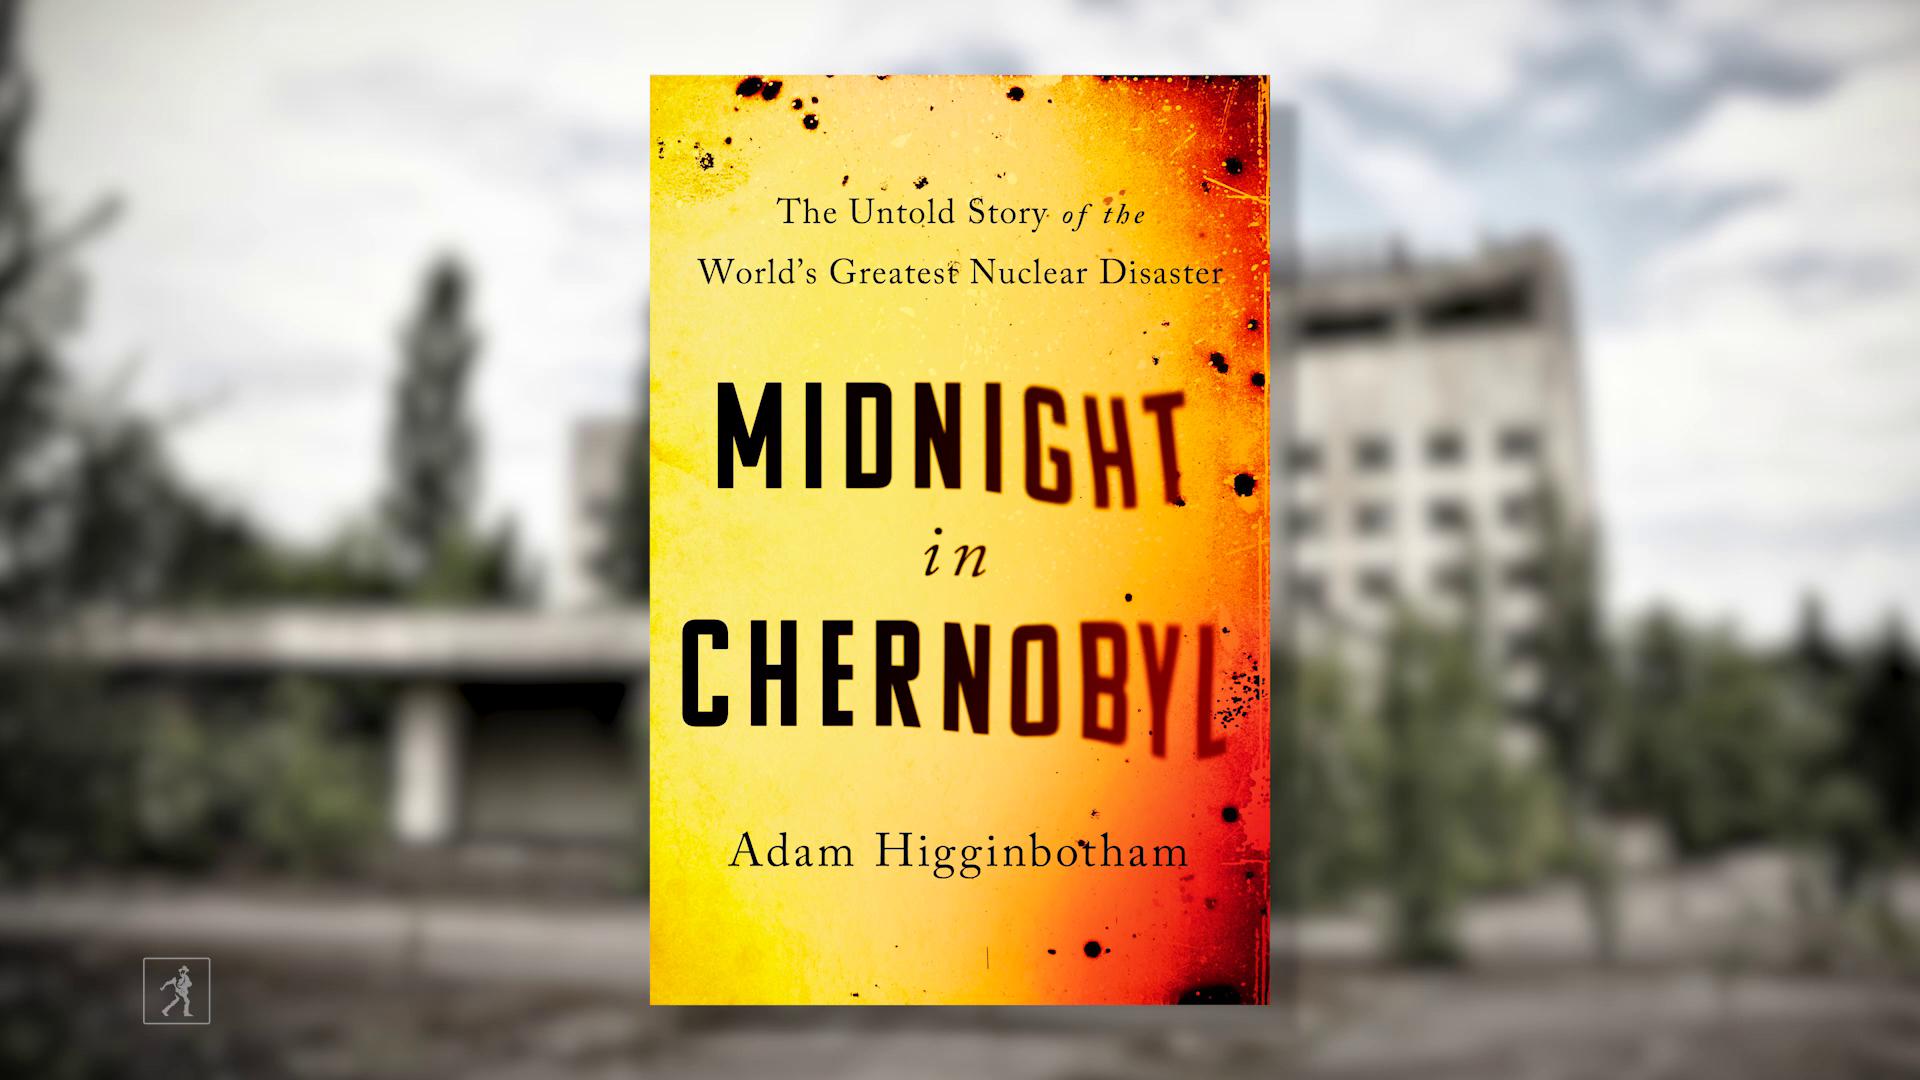 Http Www Simonandschuster Com Videos Life Before The Chernobyl